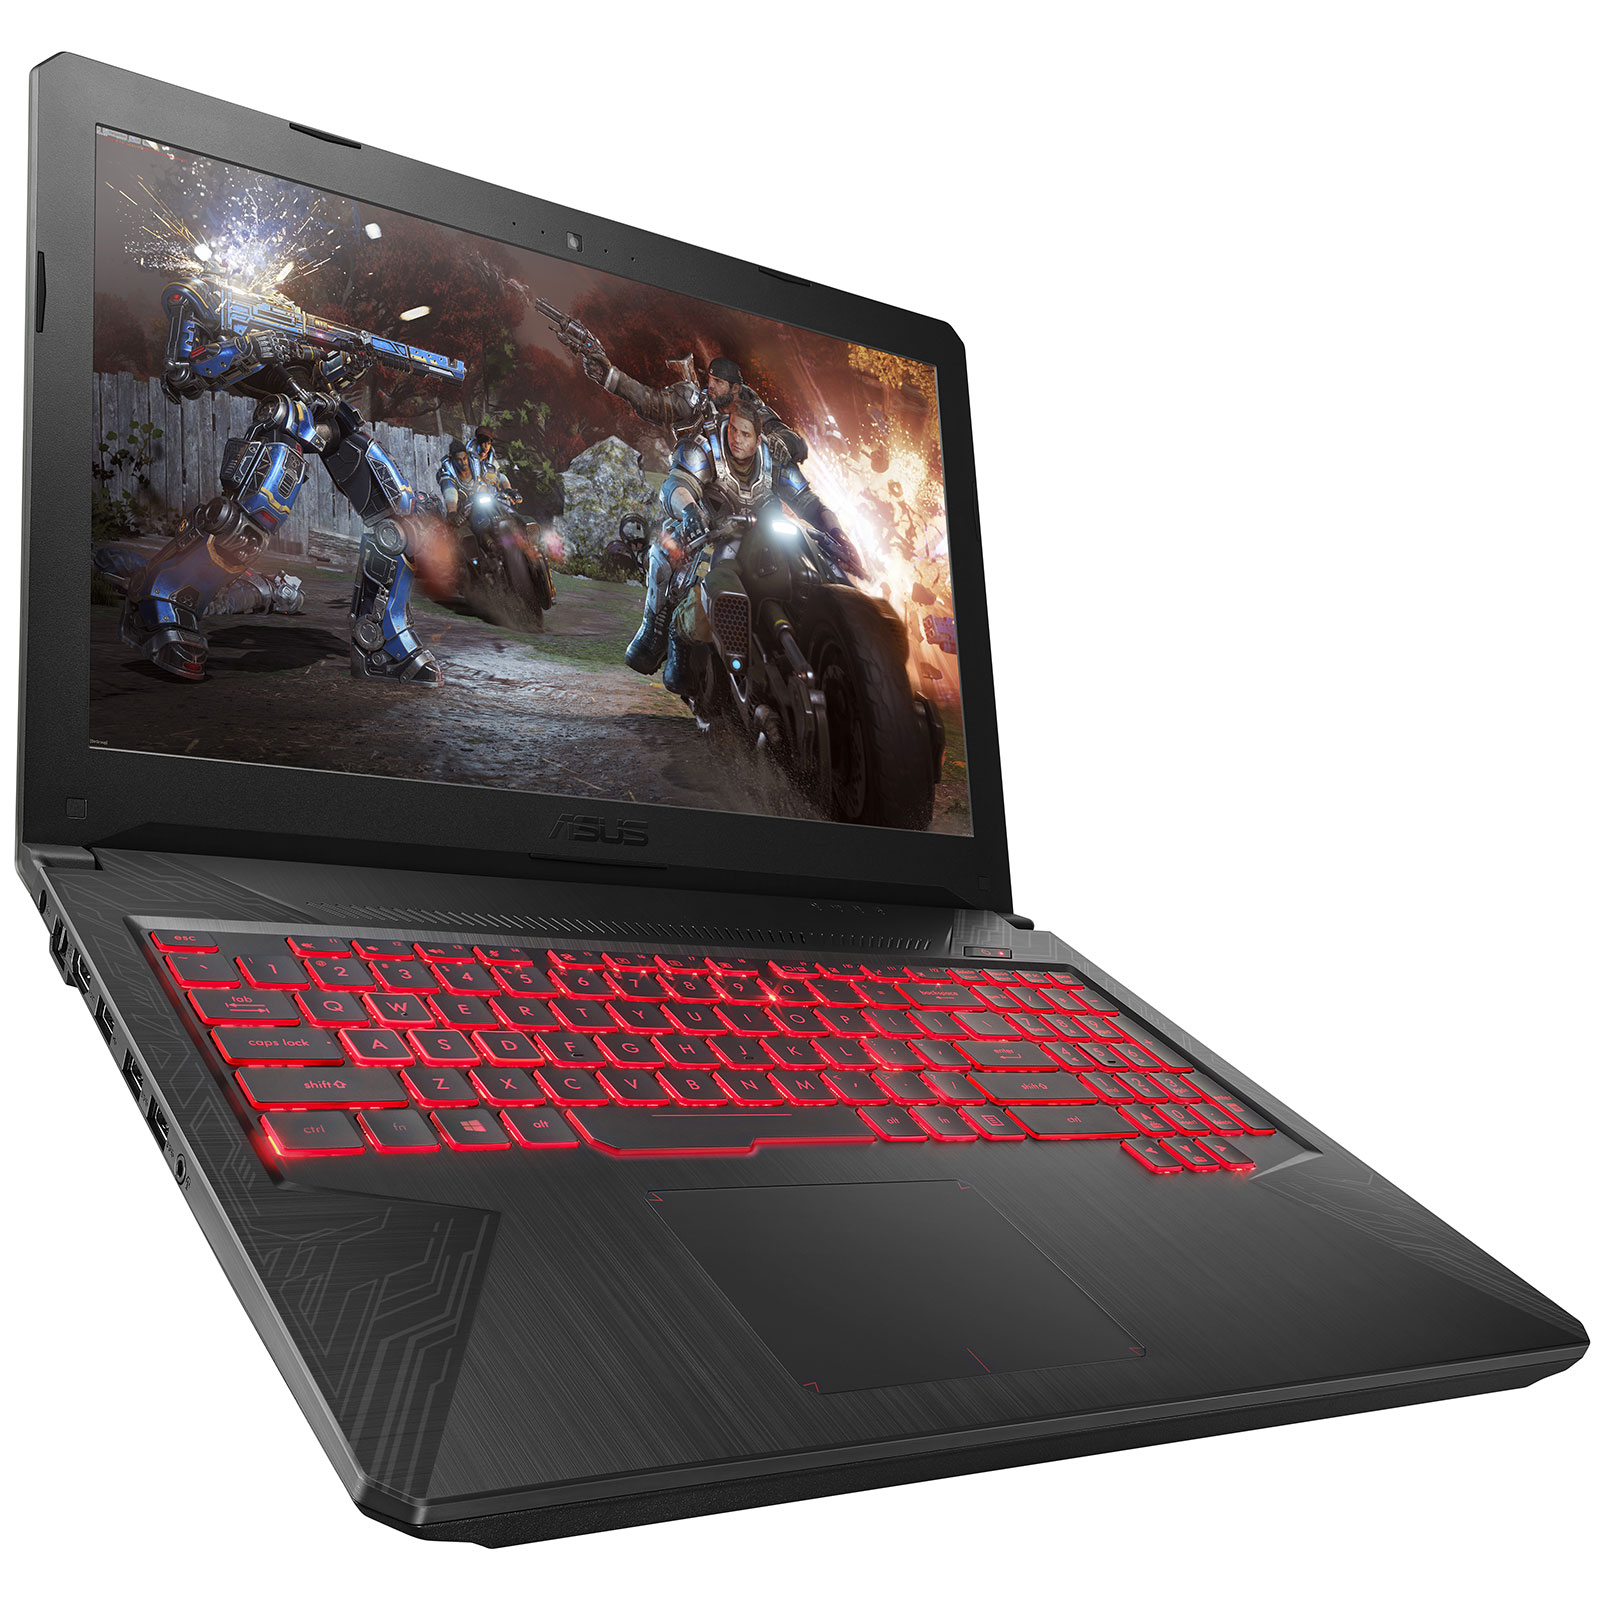 "PC portable ASUS TUF504GD-DM912T Intel Core i5-8300H 8 Go SSHD 1 To 15.6"" LED Full HD NVIDIA GeForce GTX 1050 2 Go Wi-Fi AC/Bluetooth Webcam Windows 10 Famille 64 bits (garantie constructeur 2 ans)"